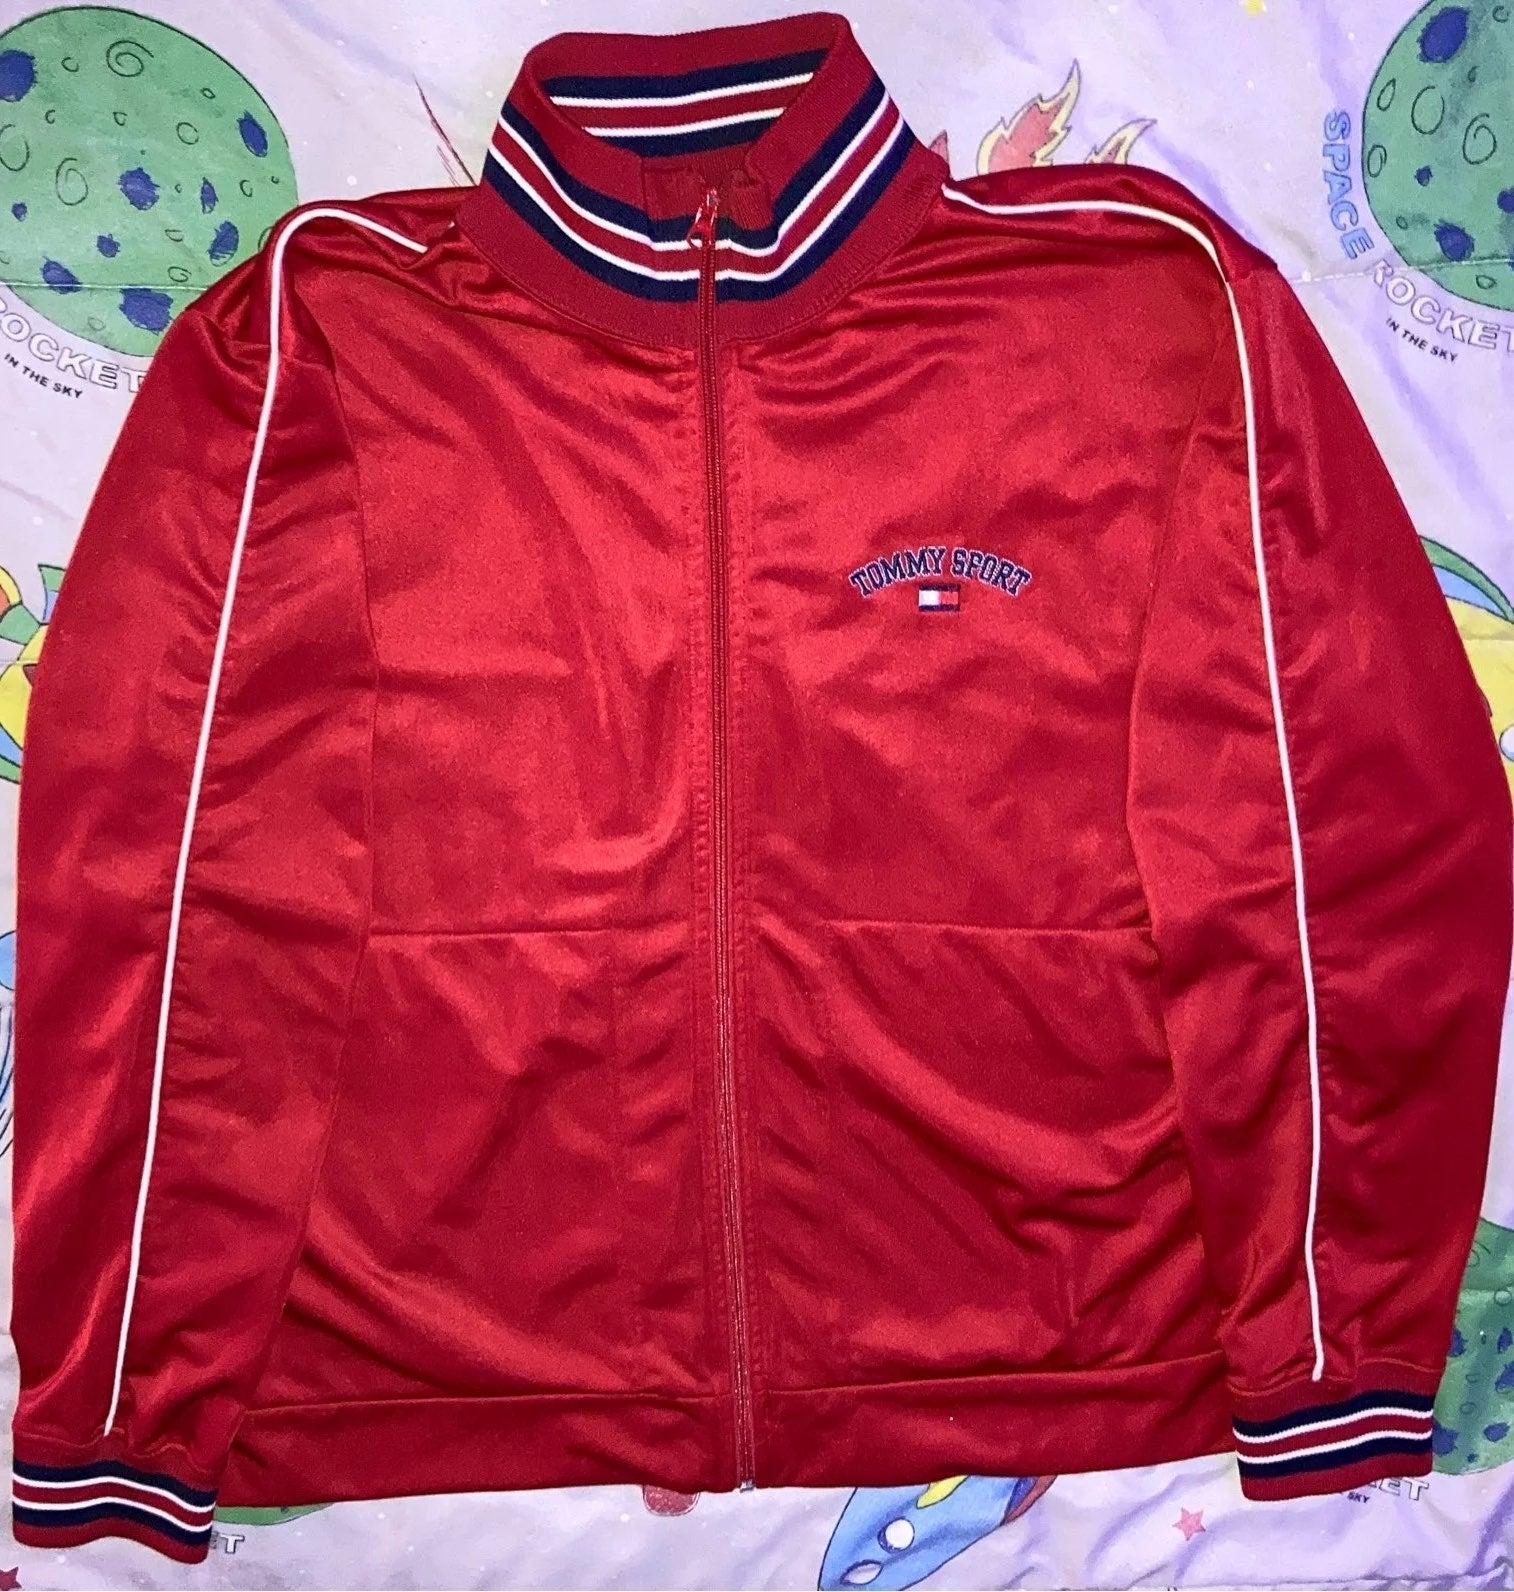 Vintage Tommy Jeans Fleece Track Jacket